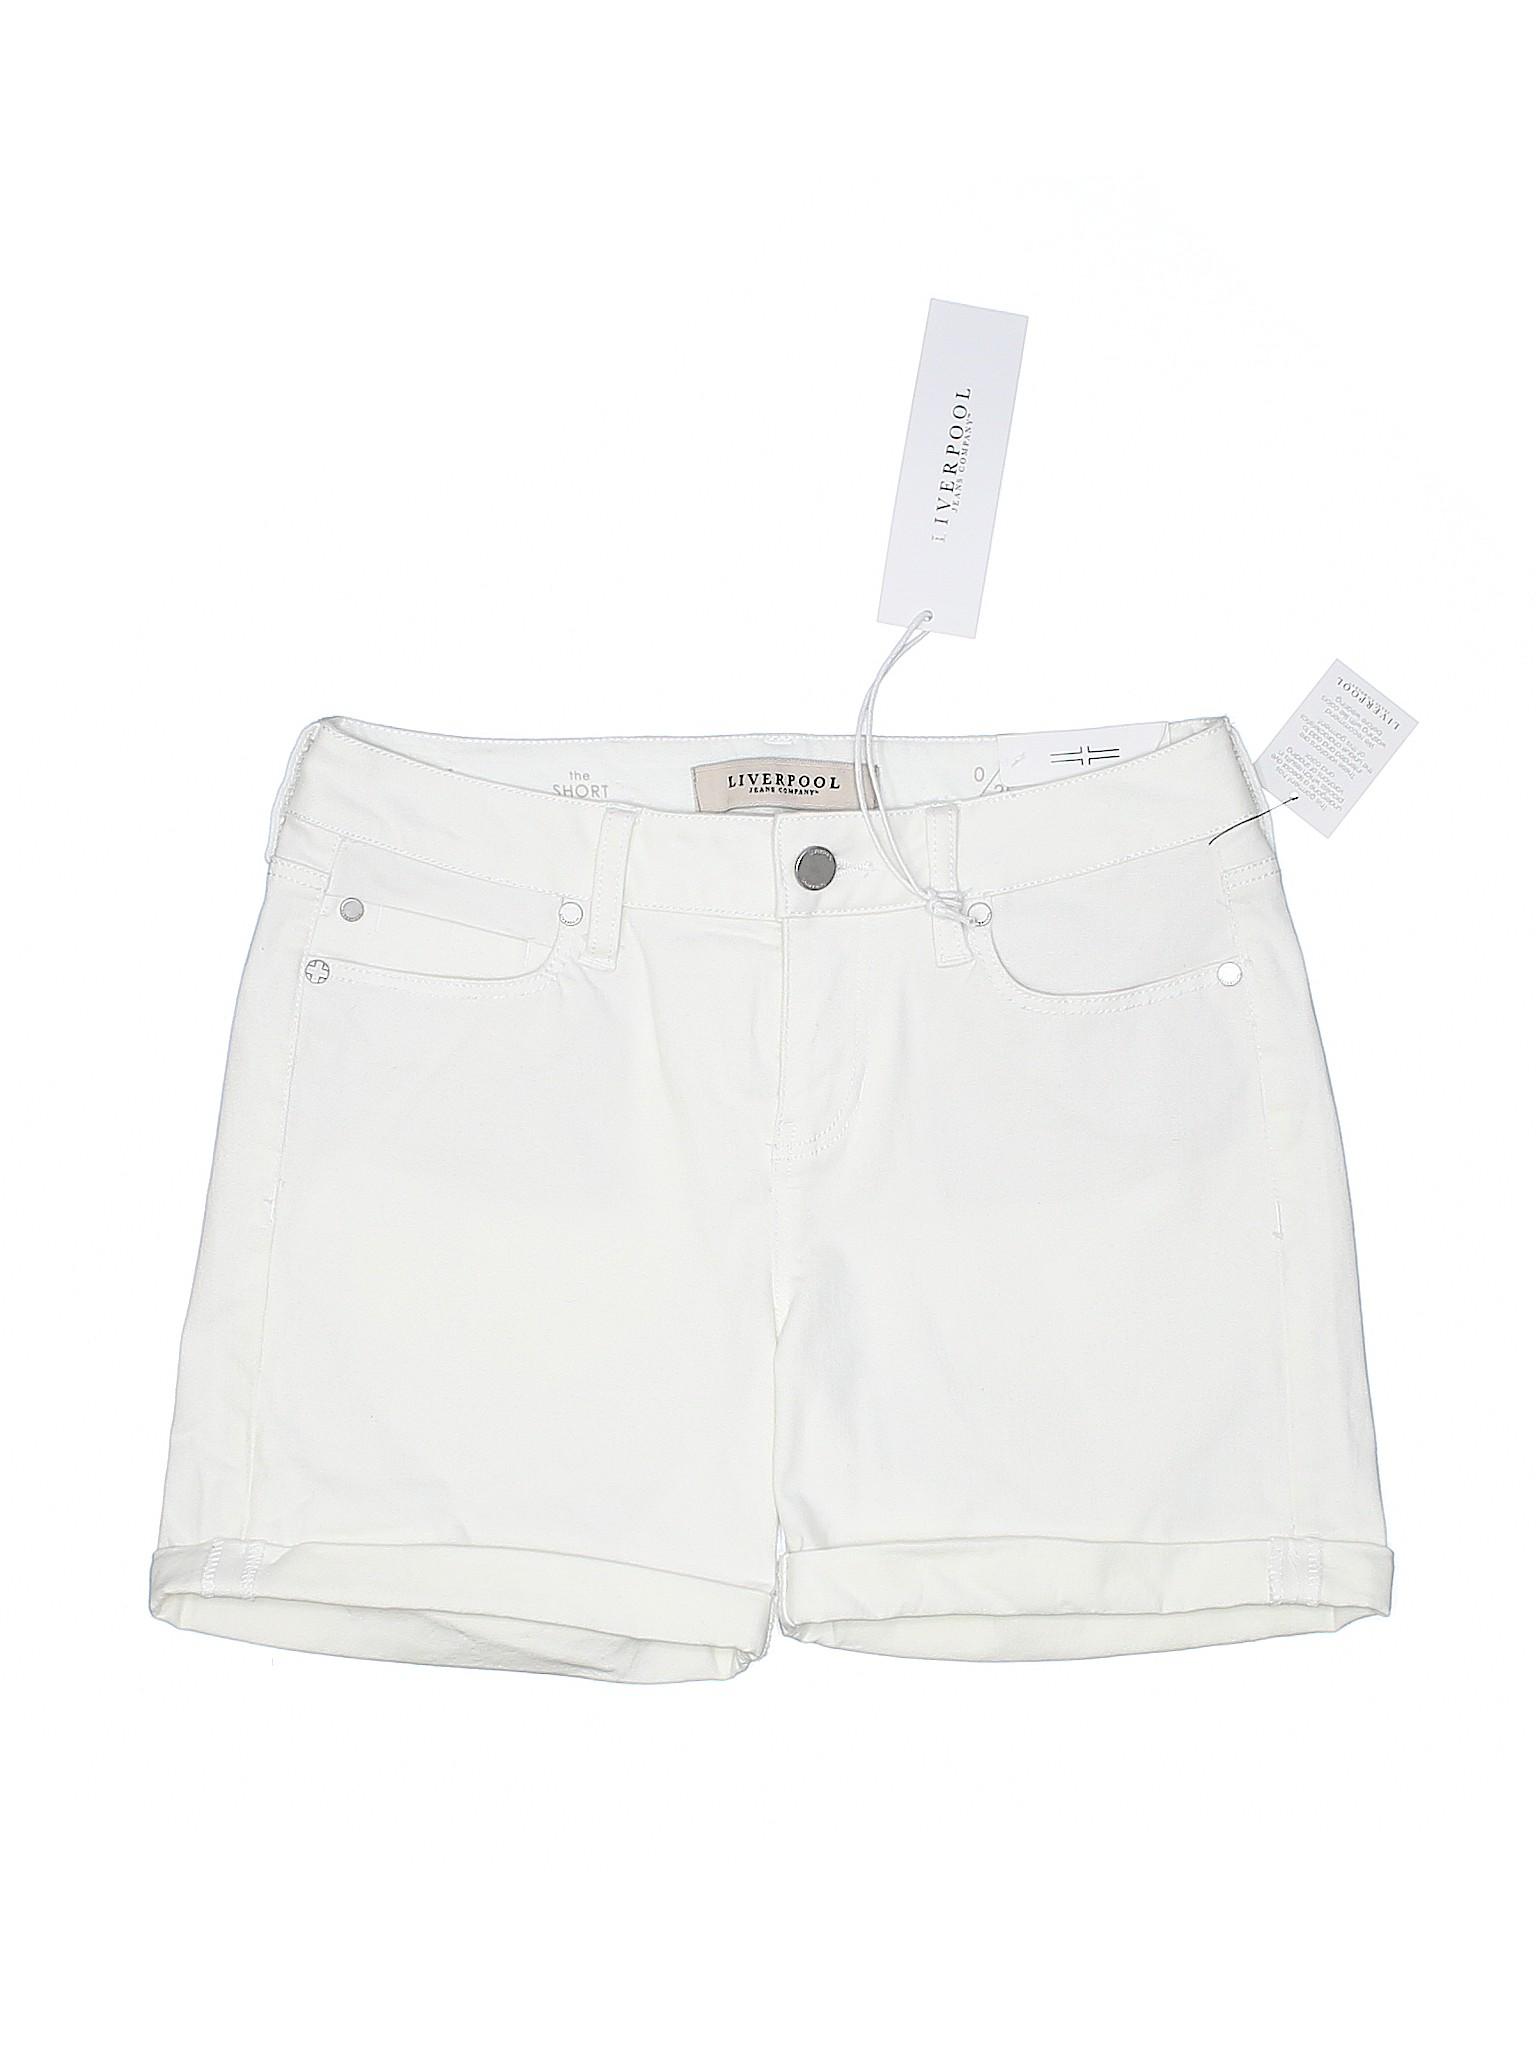 Leisure Denim Jeans Liverpool Company Boutique Shorts 6qOBwxda